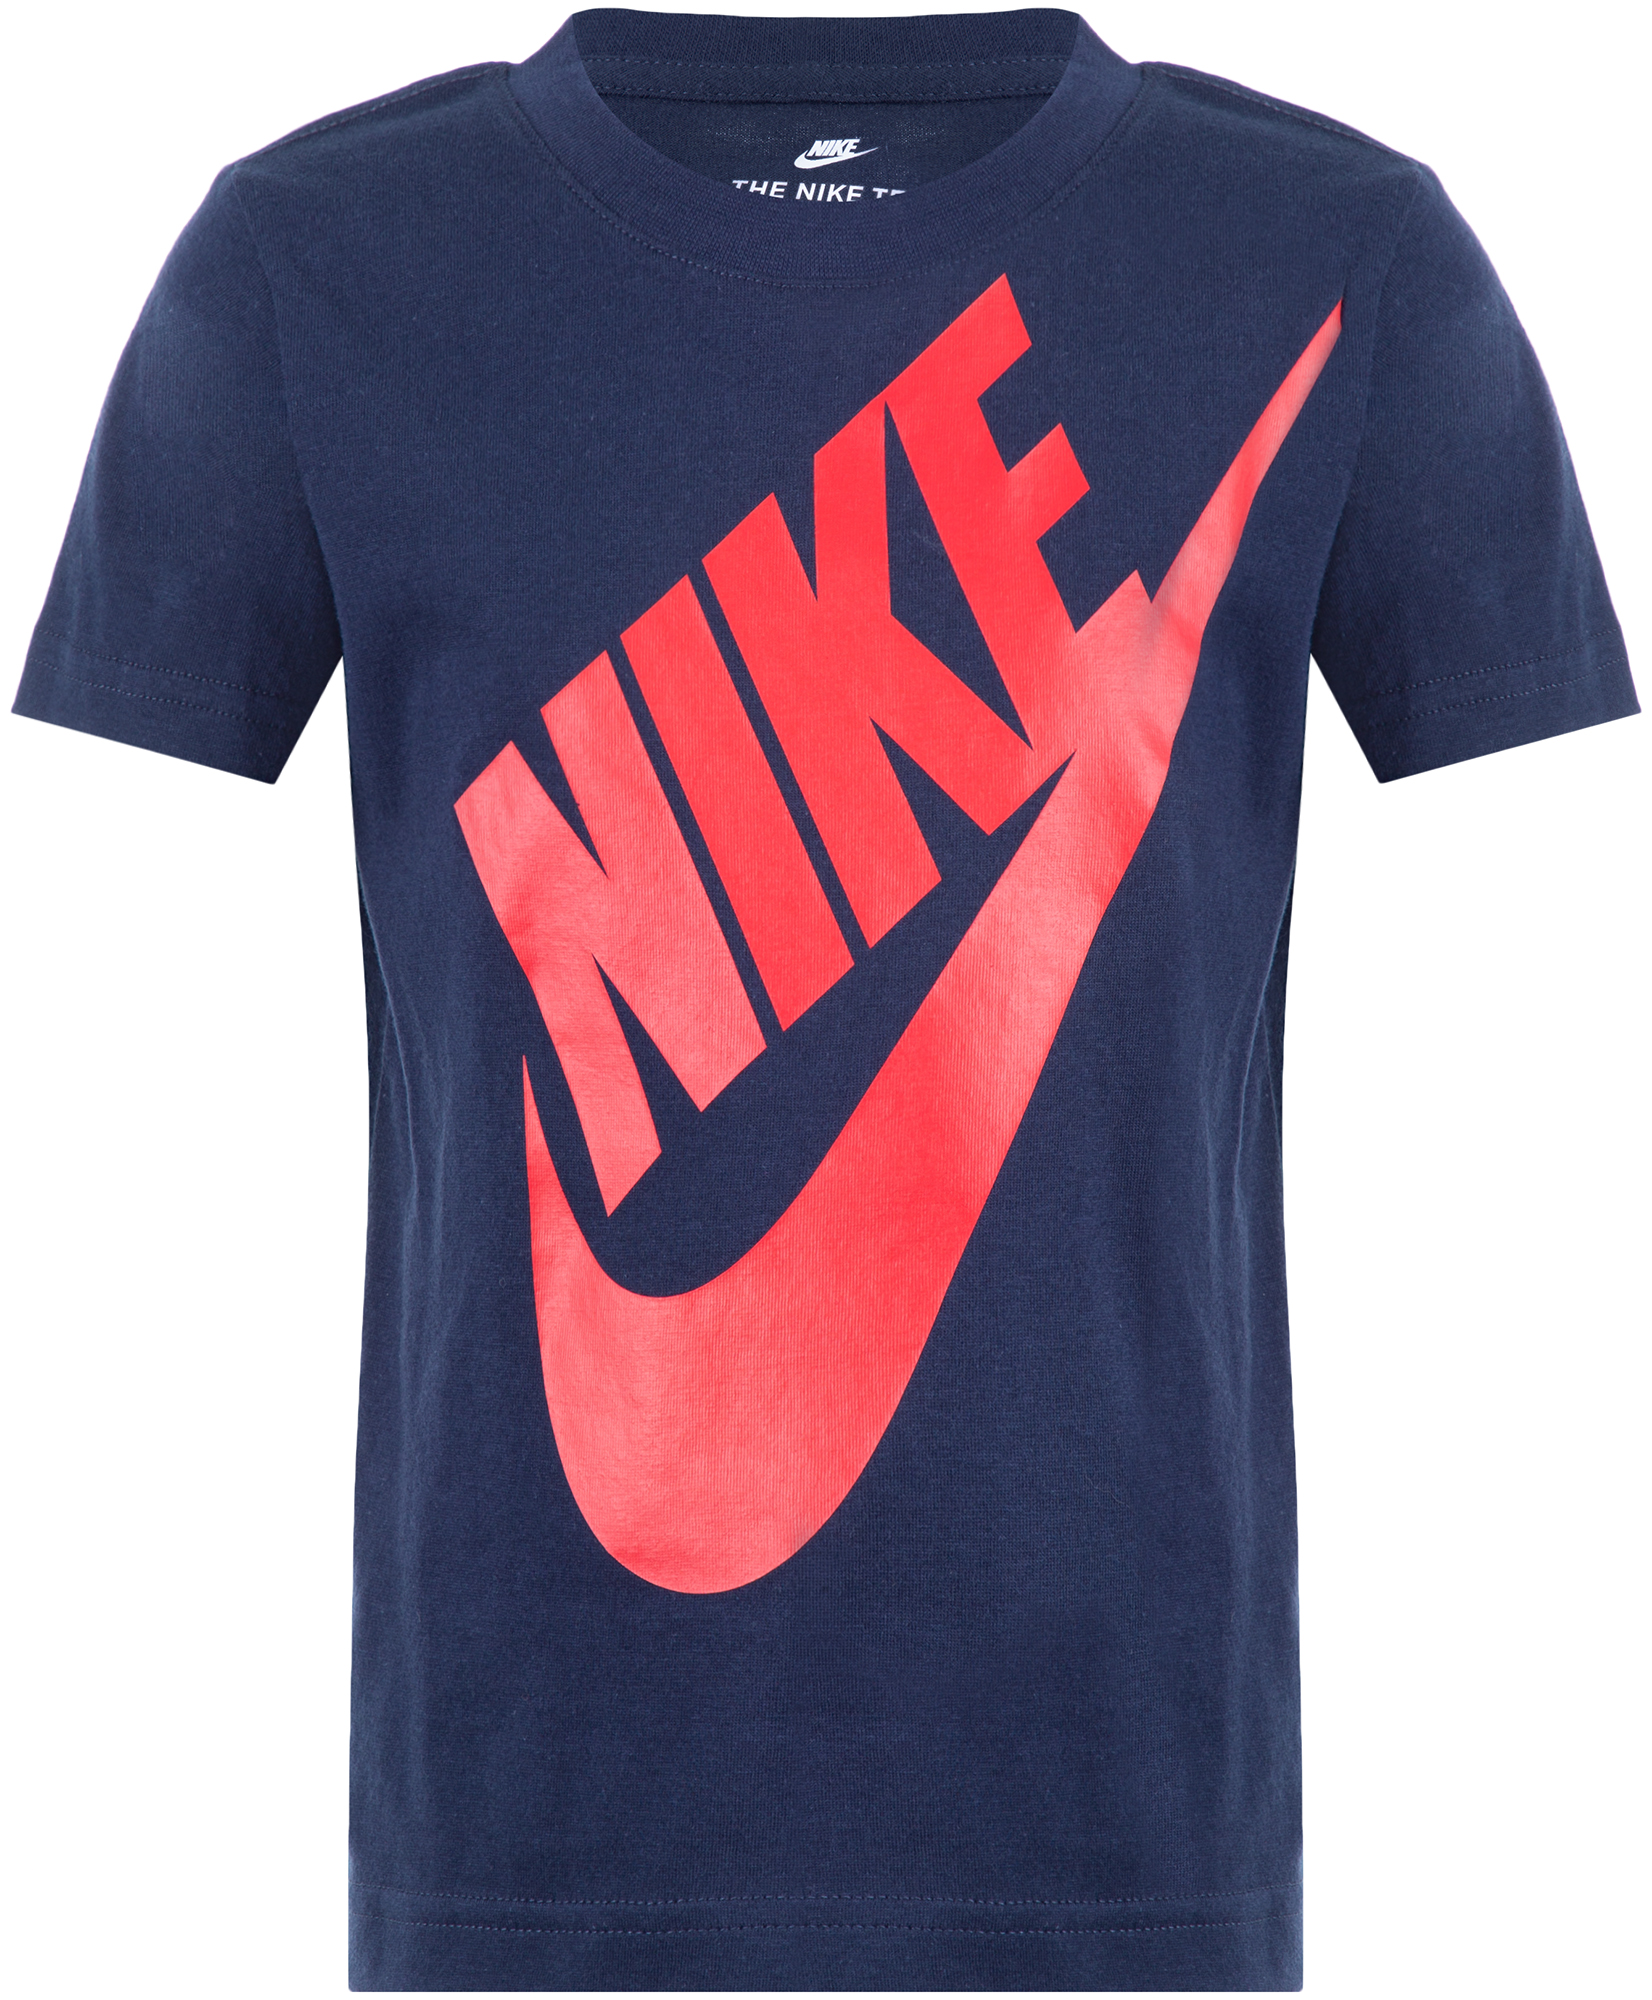 Nike Футболка для мальчиков Nike Futura, размер 122 цена 2017